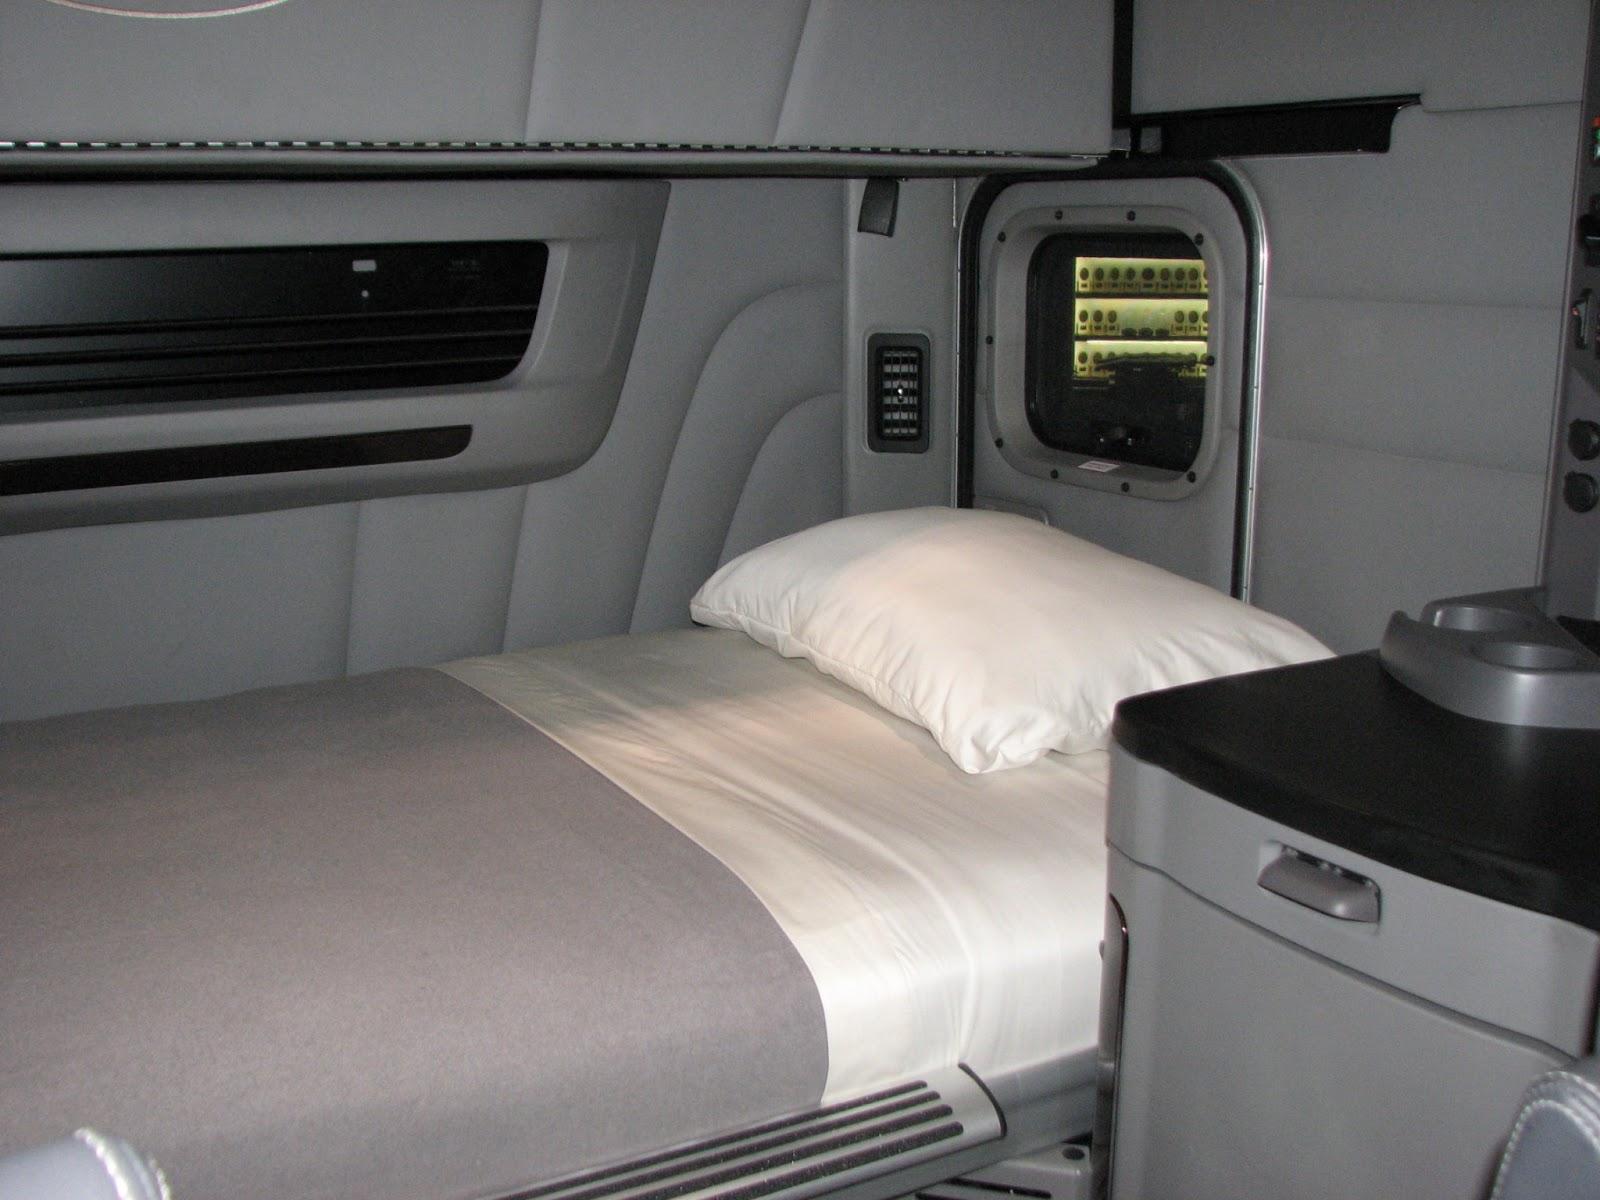 Inside The Sleeper Cab Of A Semi.html   Autos Weblog